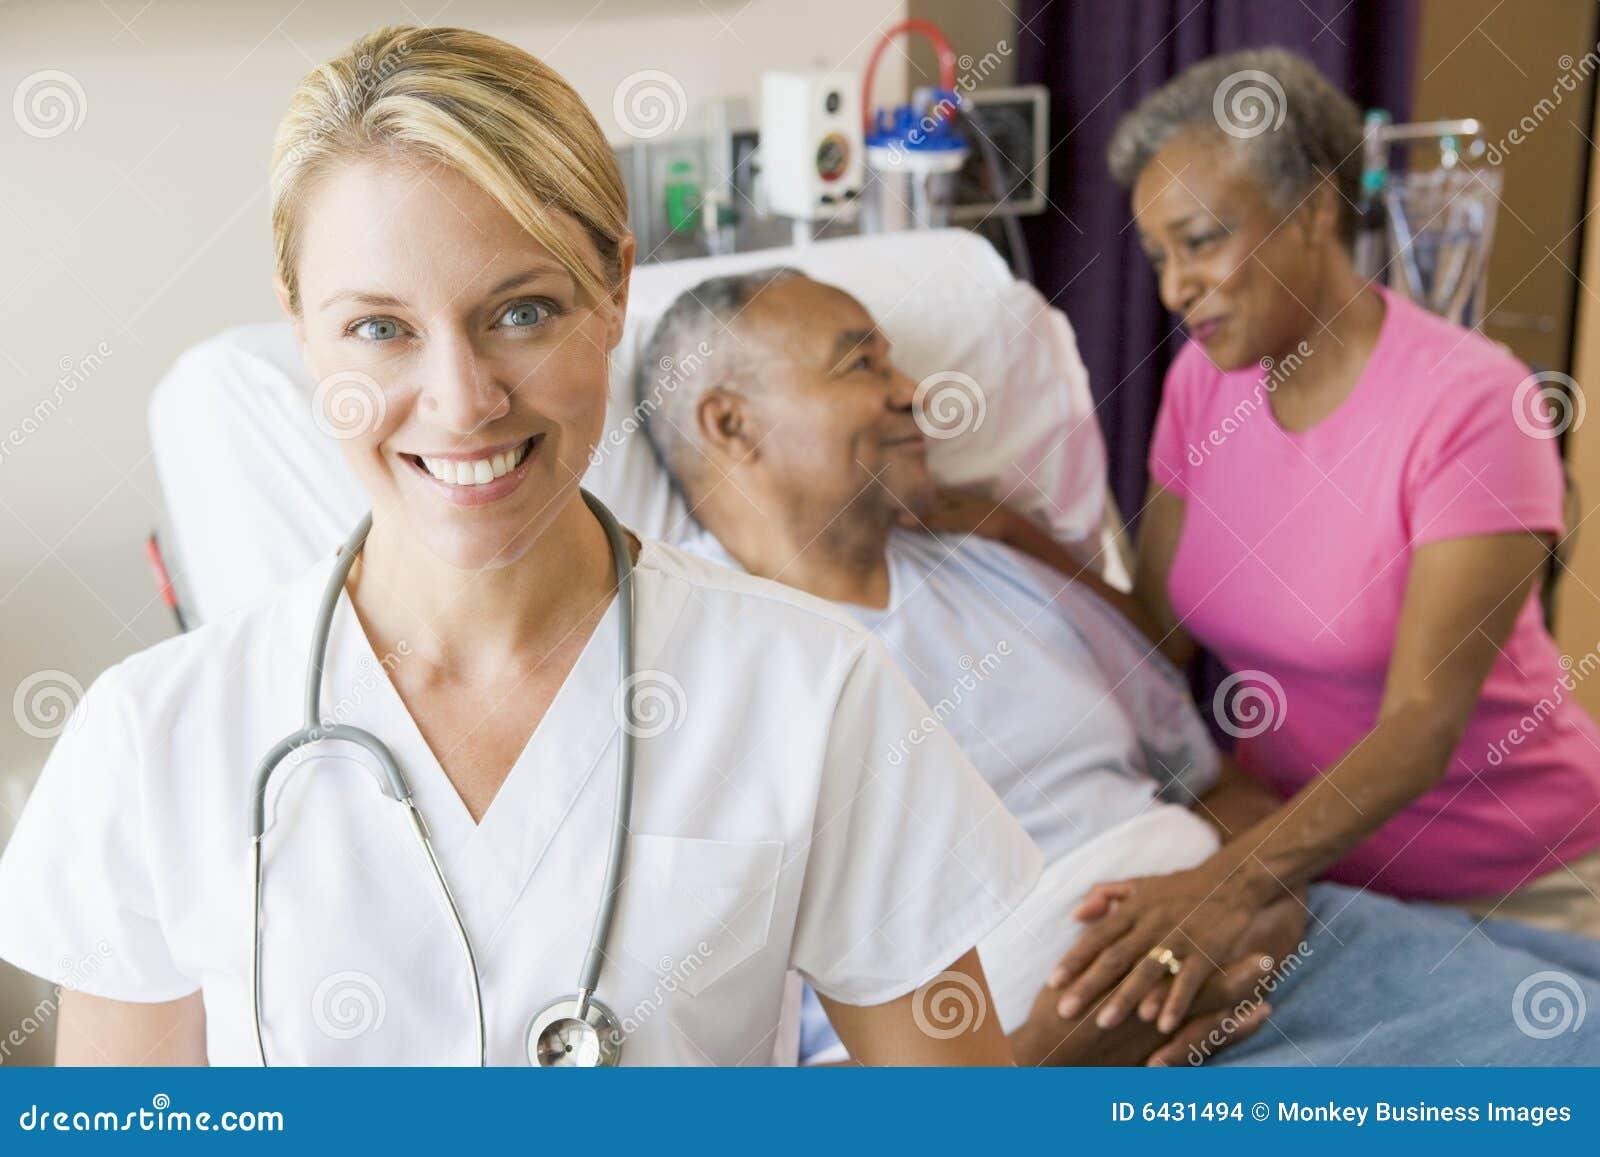 Doctor Looking Cheerful In Hospital Room